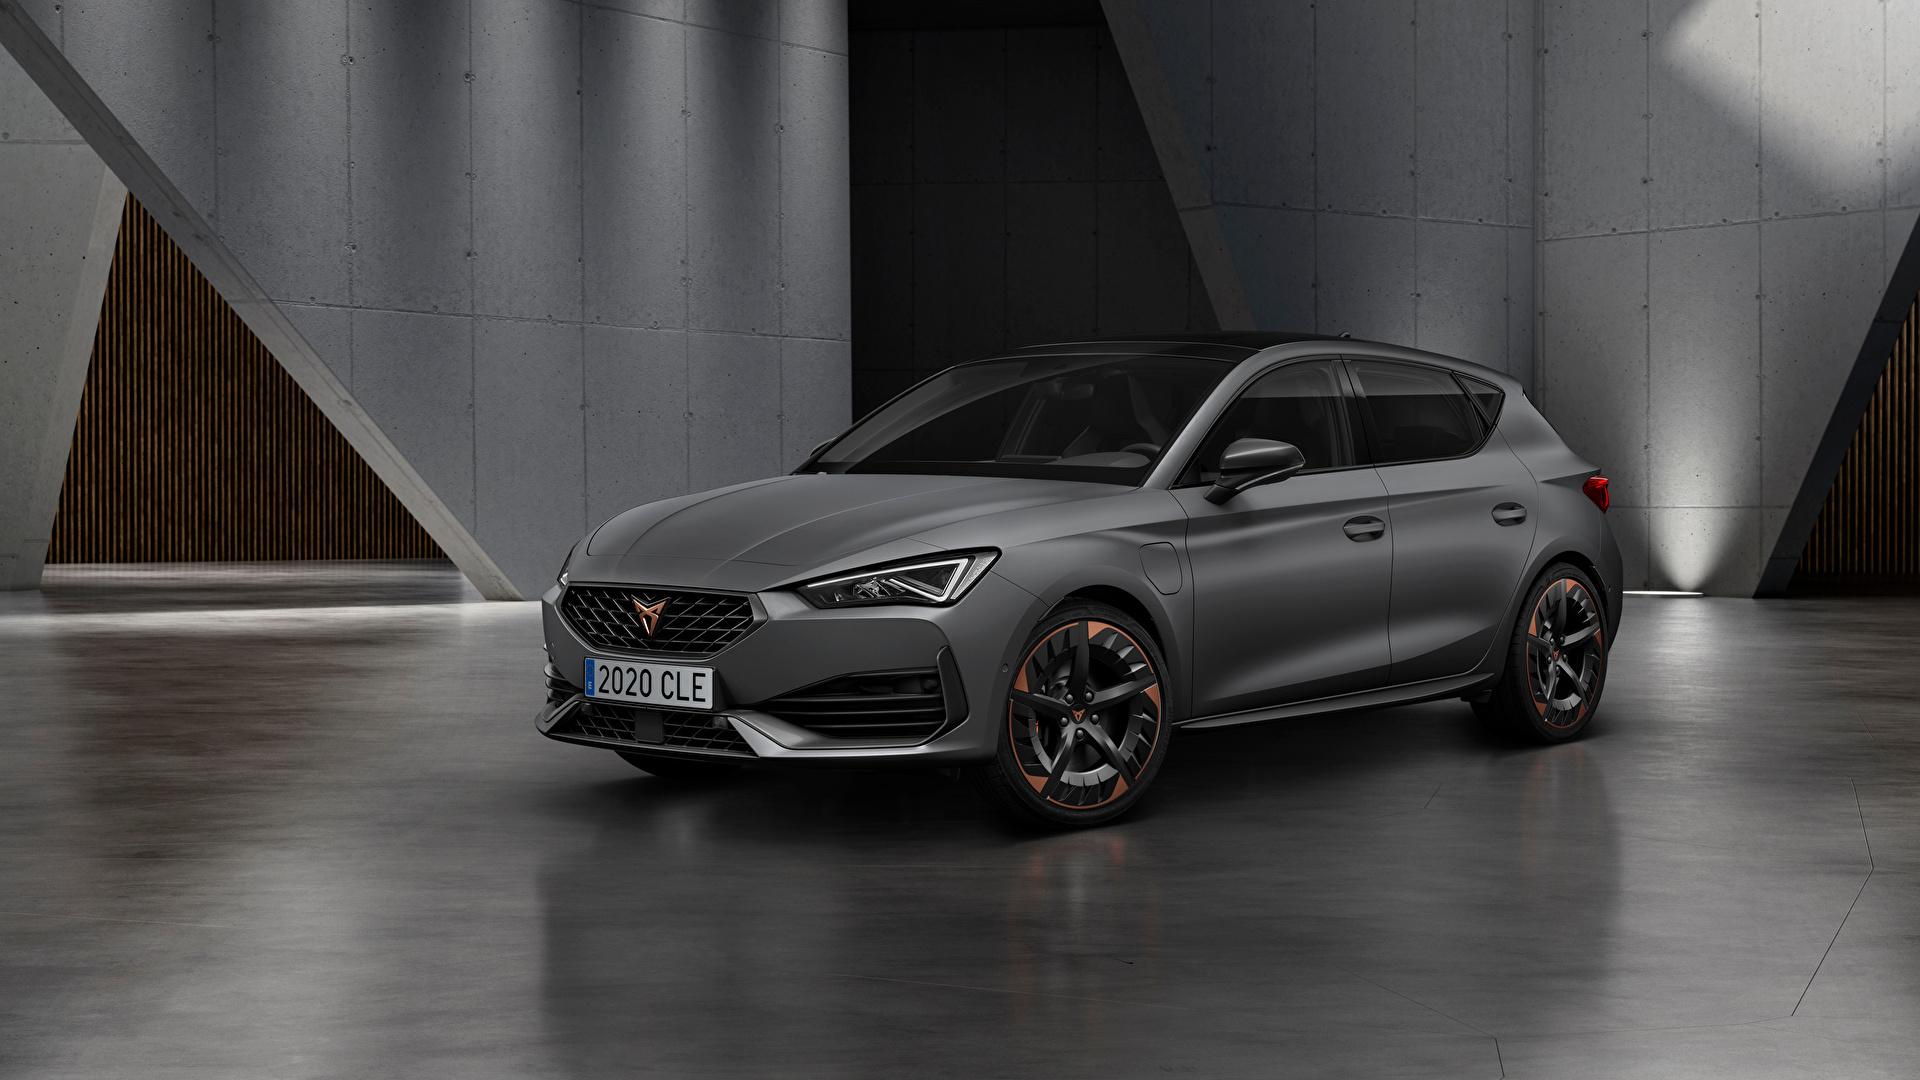 Bilder von Seat Cupra Leon eHybrid, Worldwide, 2020 graues automobil 1920x1080 Grau graue auto Autos